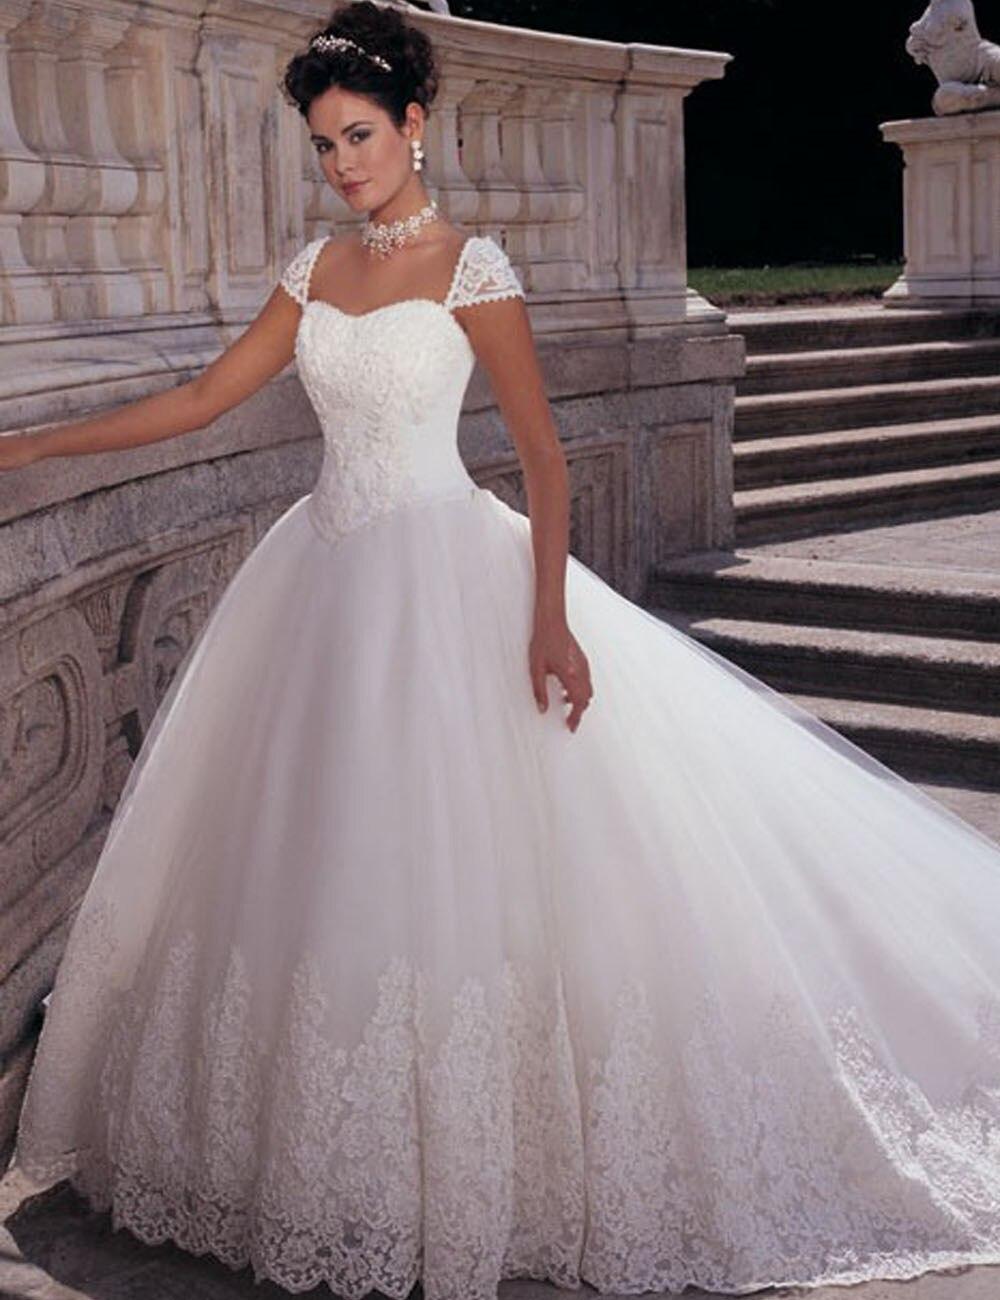 Princess Beaded Appliqued Lace Appliques Vestido De Noiva Casamento Robe De Mariage Bridal Gown 2018 Mother Of The Bride Dresses